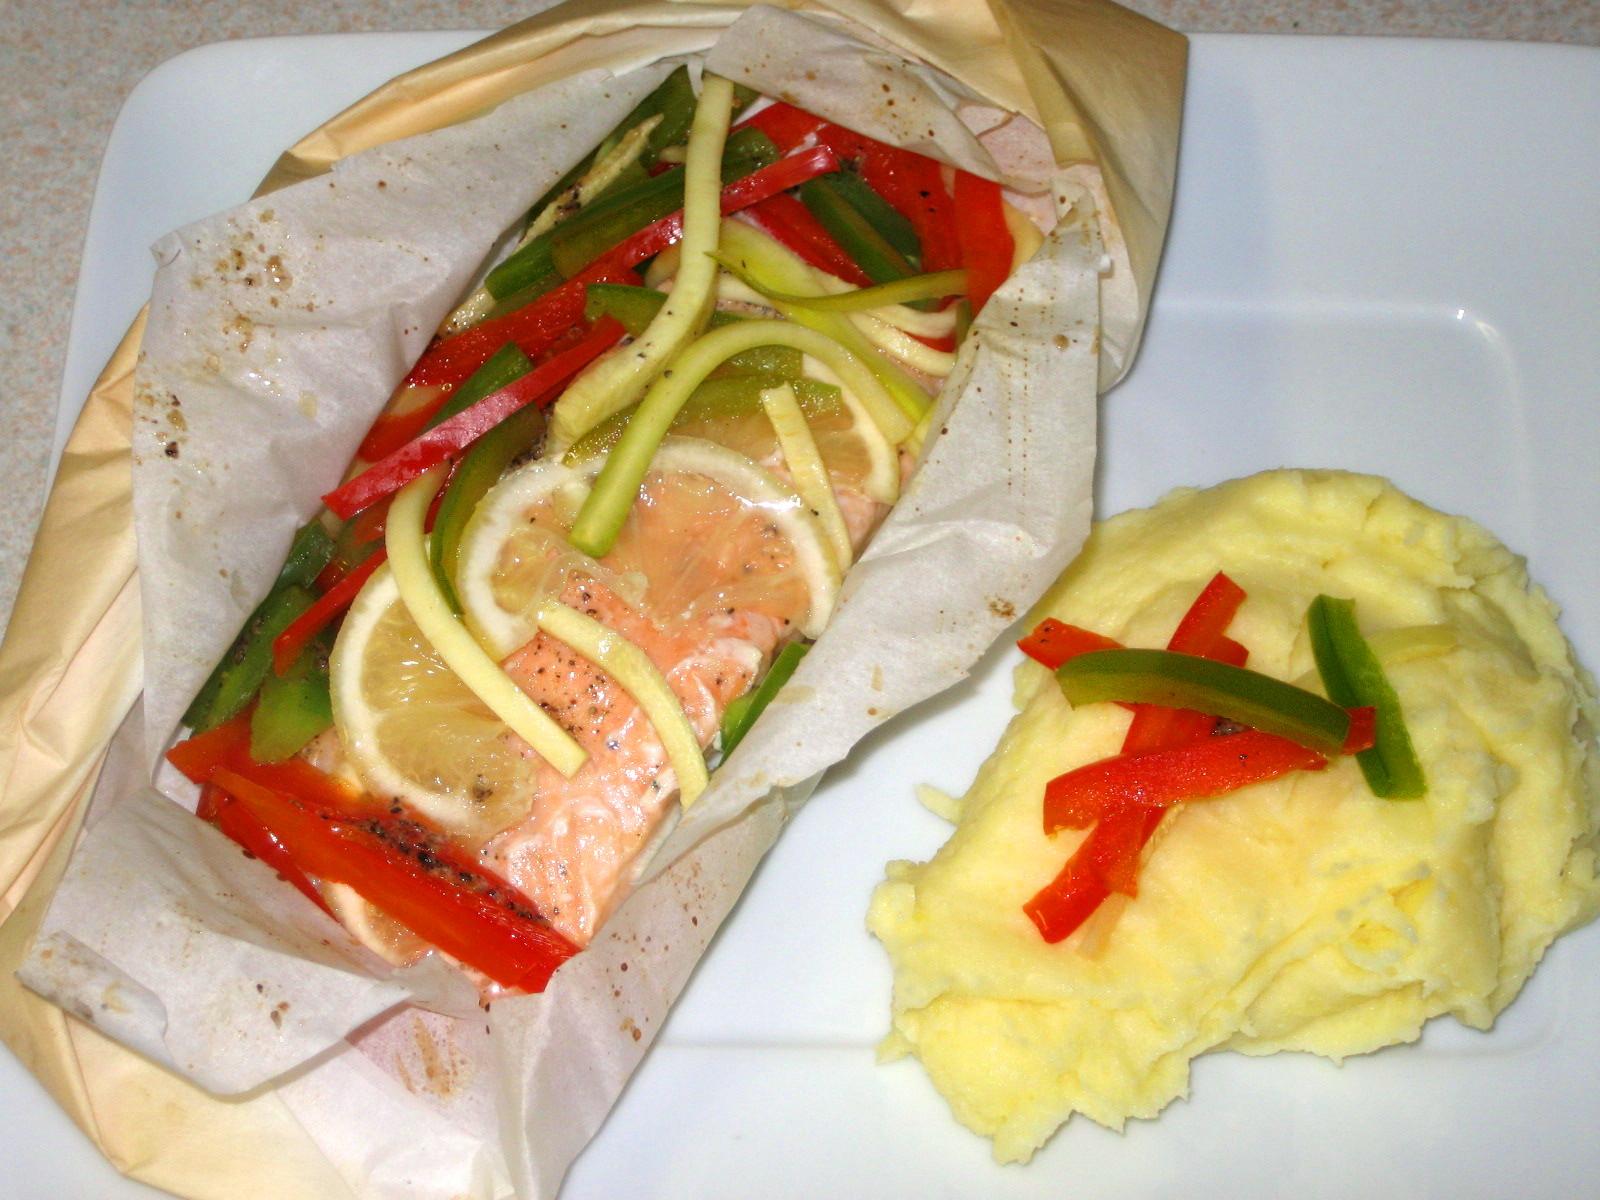 My food garden golf etc saumon en papillote - Saumon en papillote ...